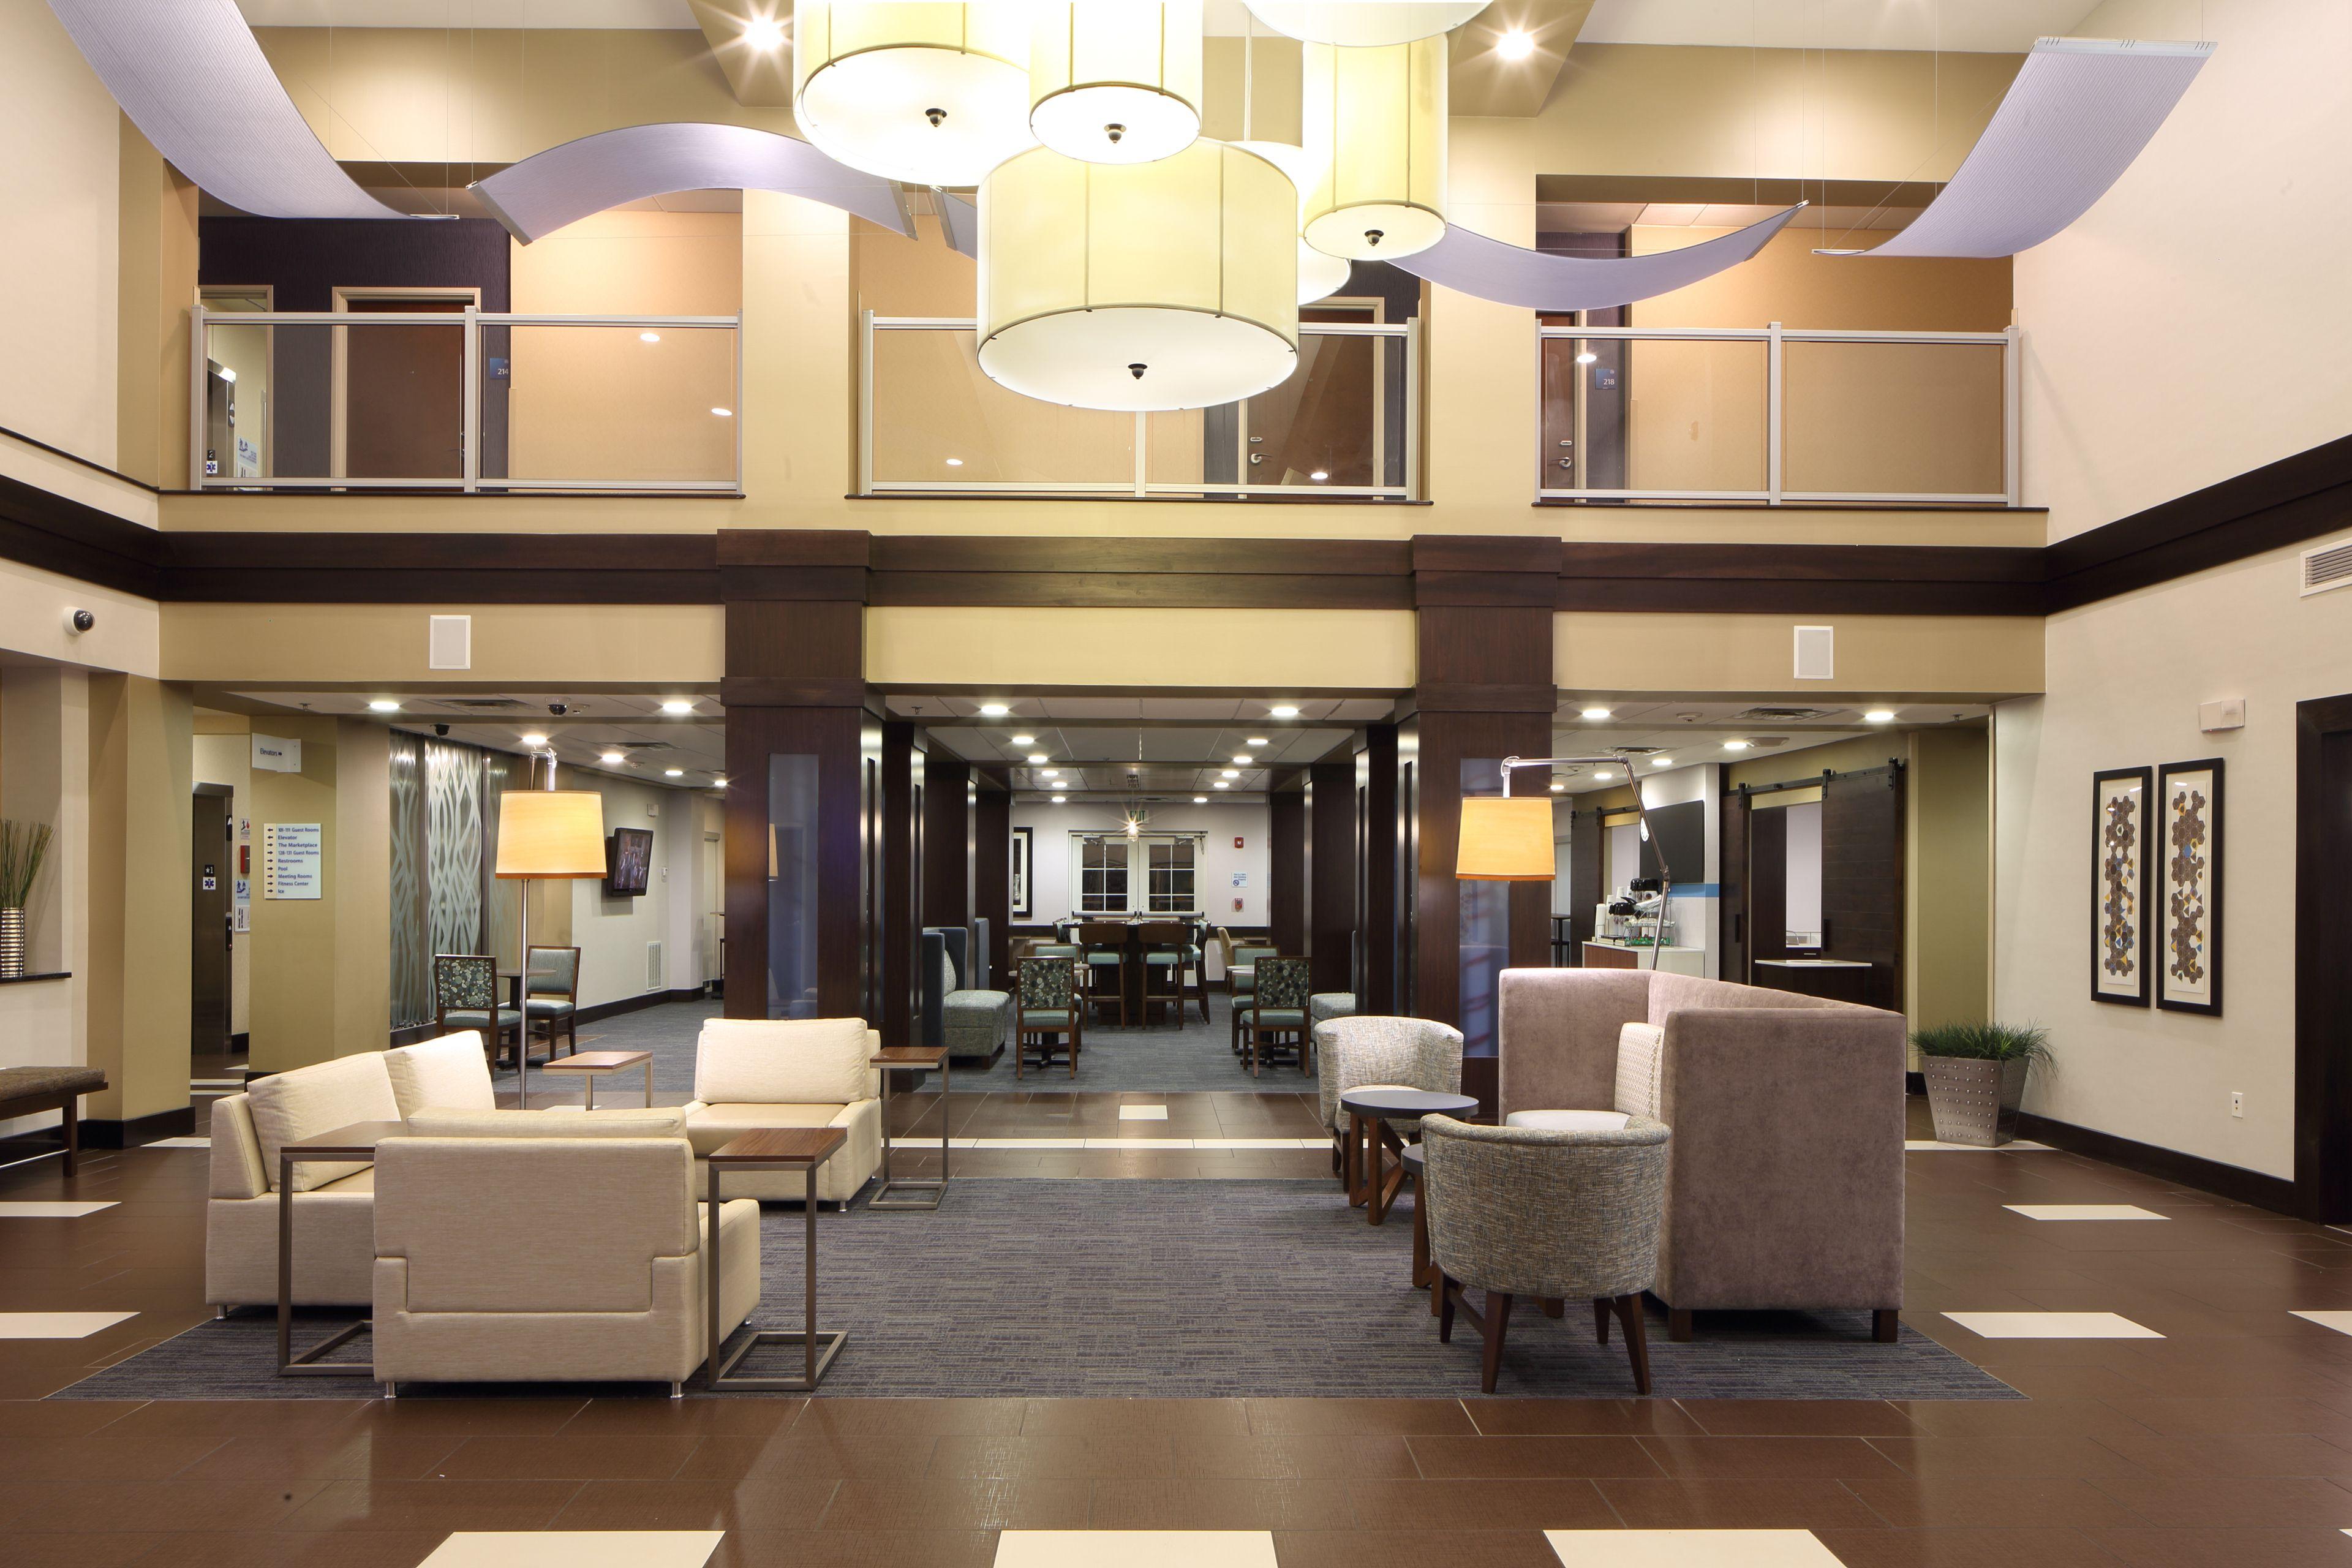 Holiday Inn Express & Suites Atlanta Arpt West - Camp Creek image 6